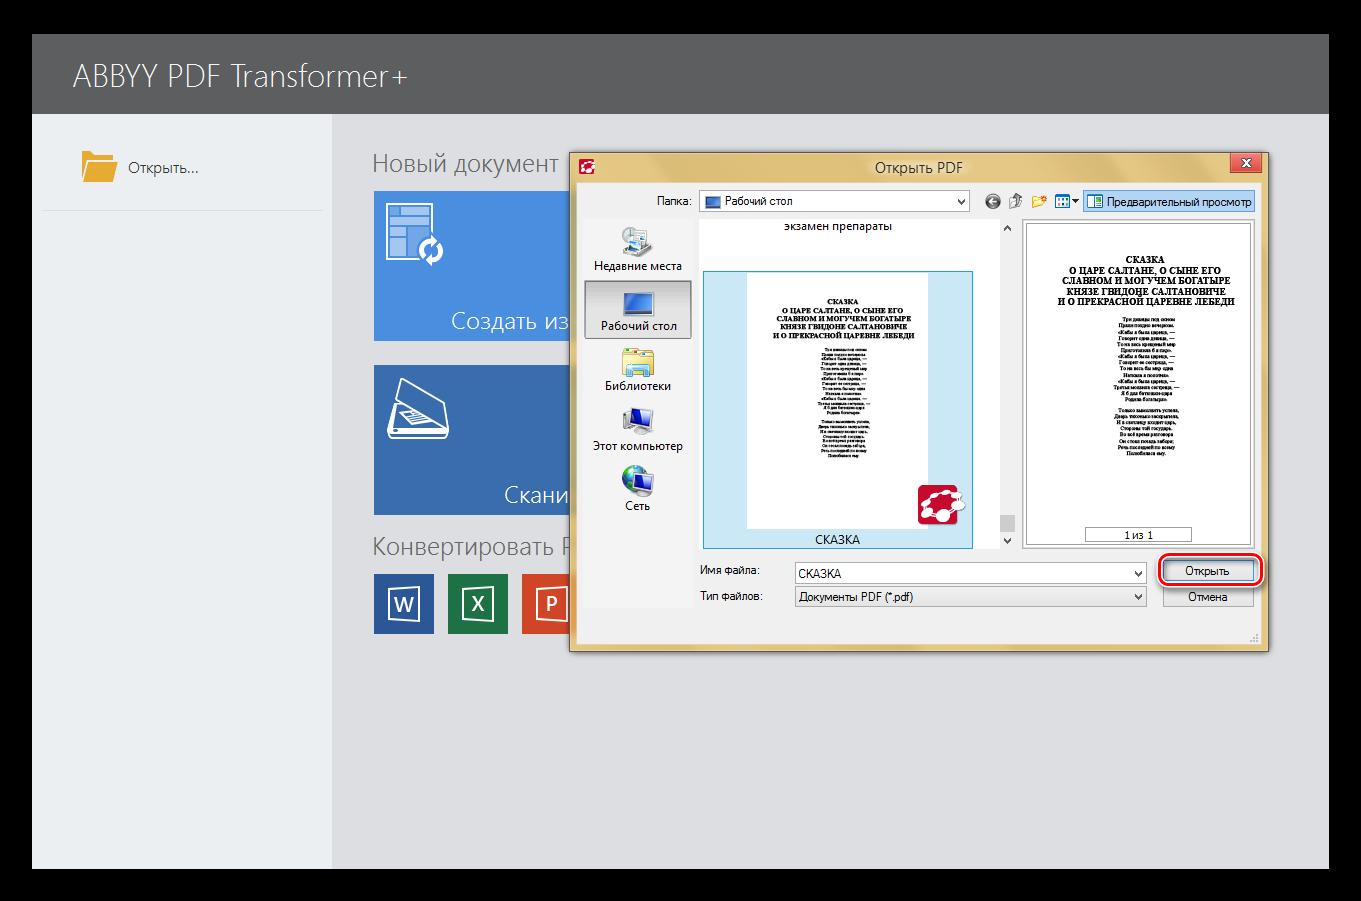 открытие файла в ABBYY PDF Transformer+